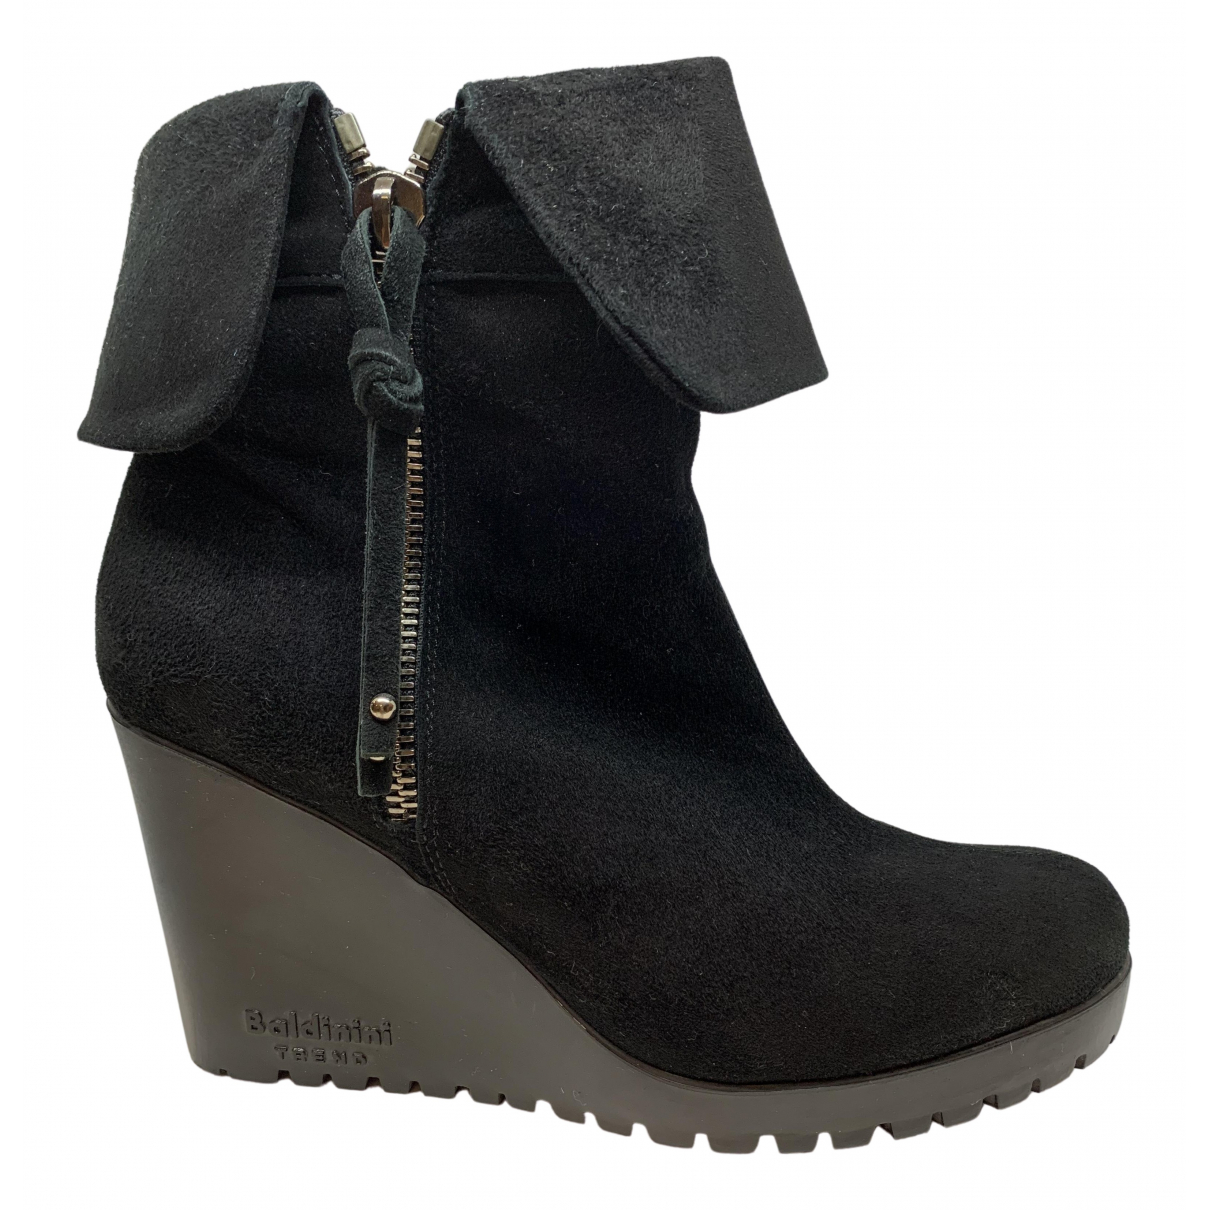 Baldinini \N Black Suede Ankle boots for Women 40.5 EU